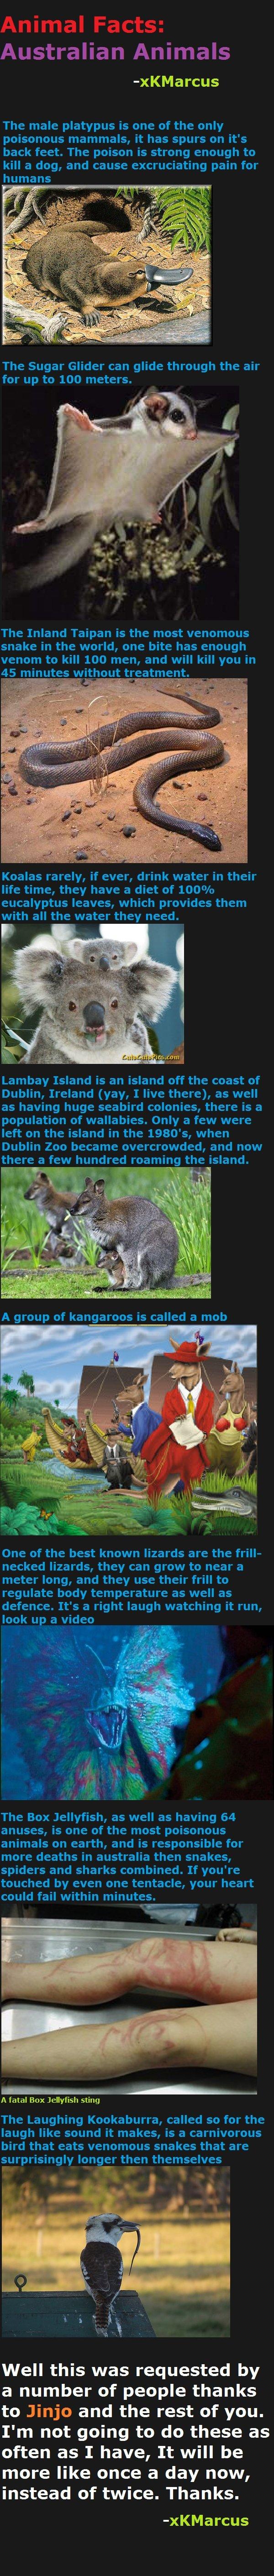 Animal Facts: Australian Animals. Animal Facts Prehistoric Animals 2 - /funny_pictures/2261070/Animal+Facts+Prehistori... . Animal Facts: Prehistoric Animals -  animal facts